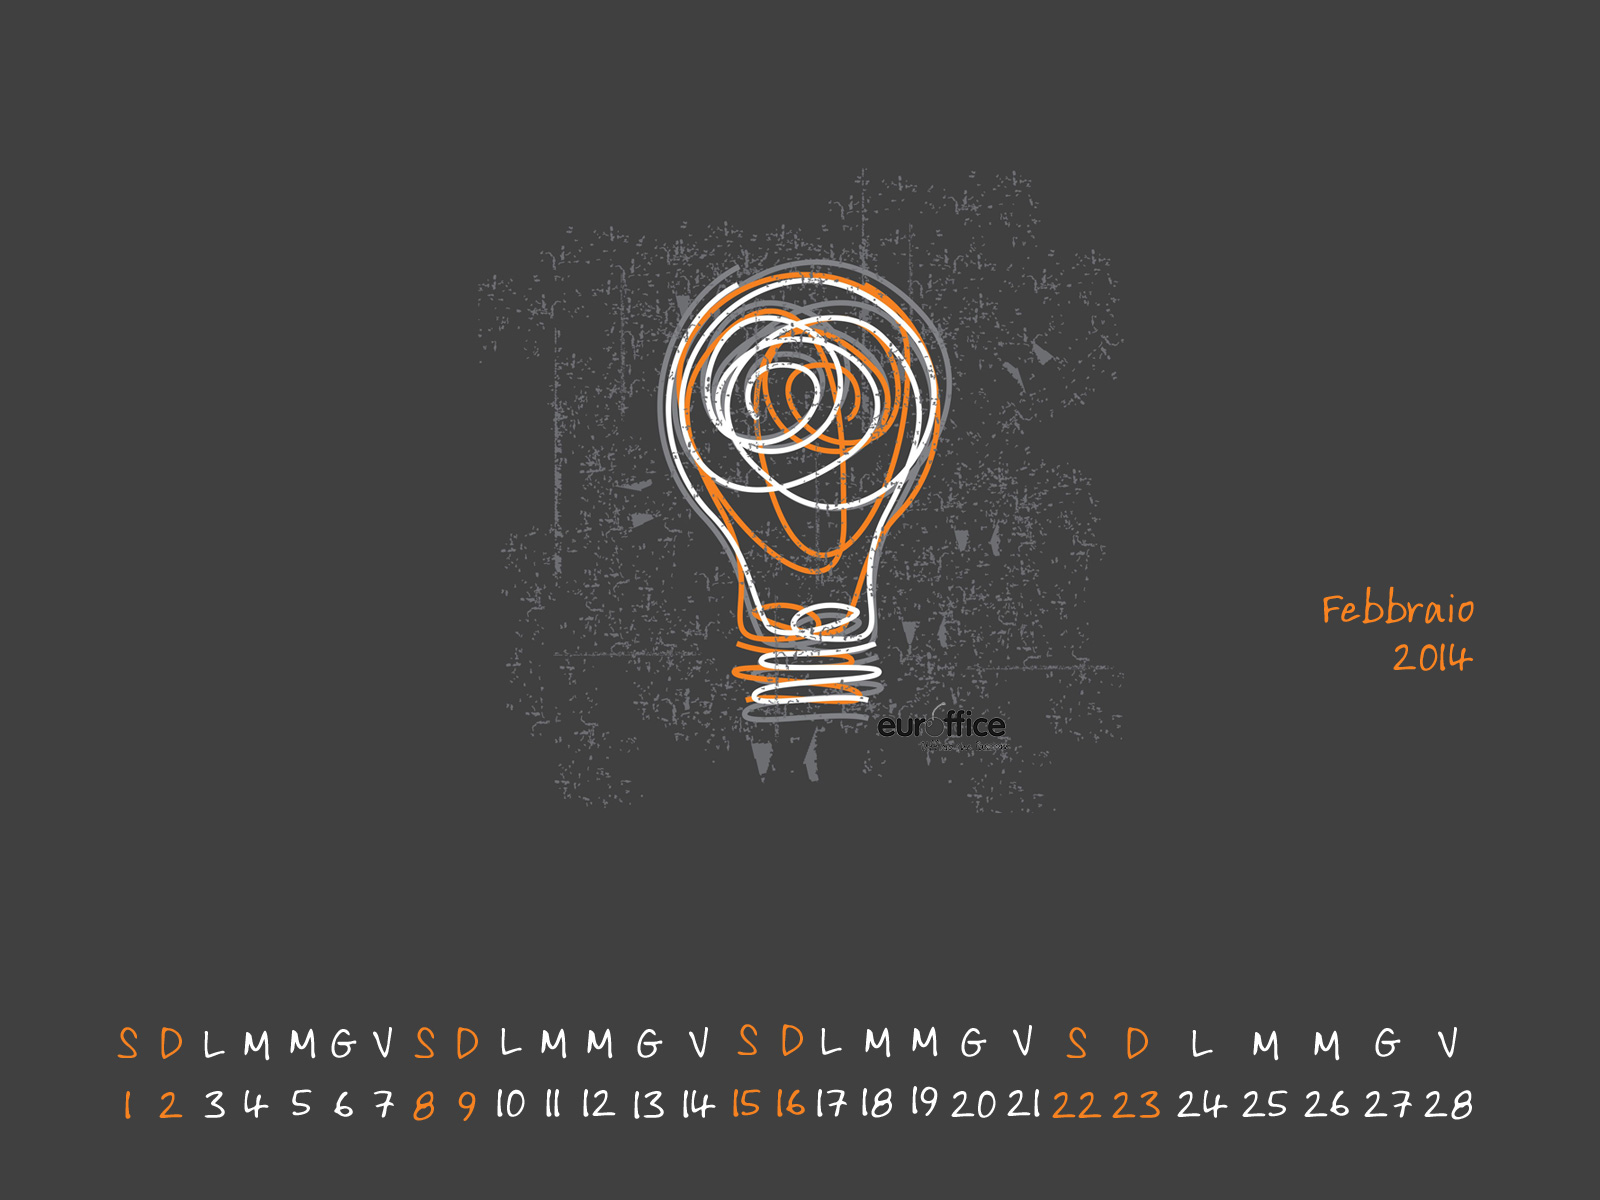 Wallpaper febbraio 2014 - Idea